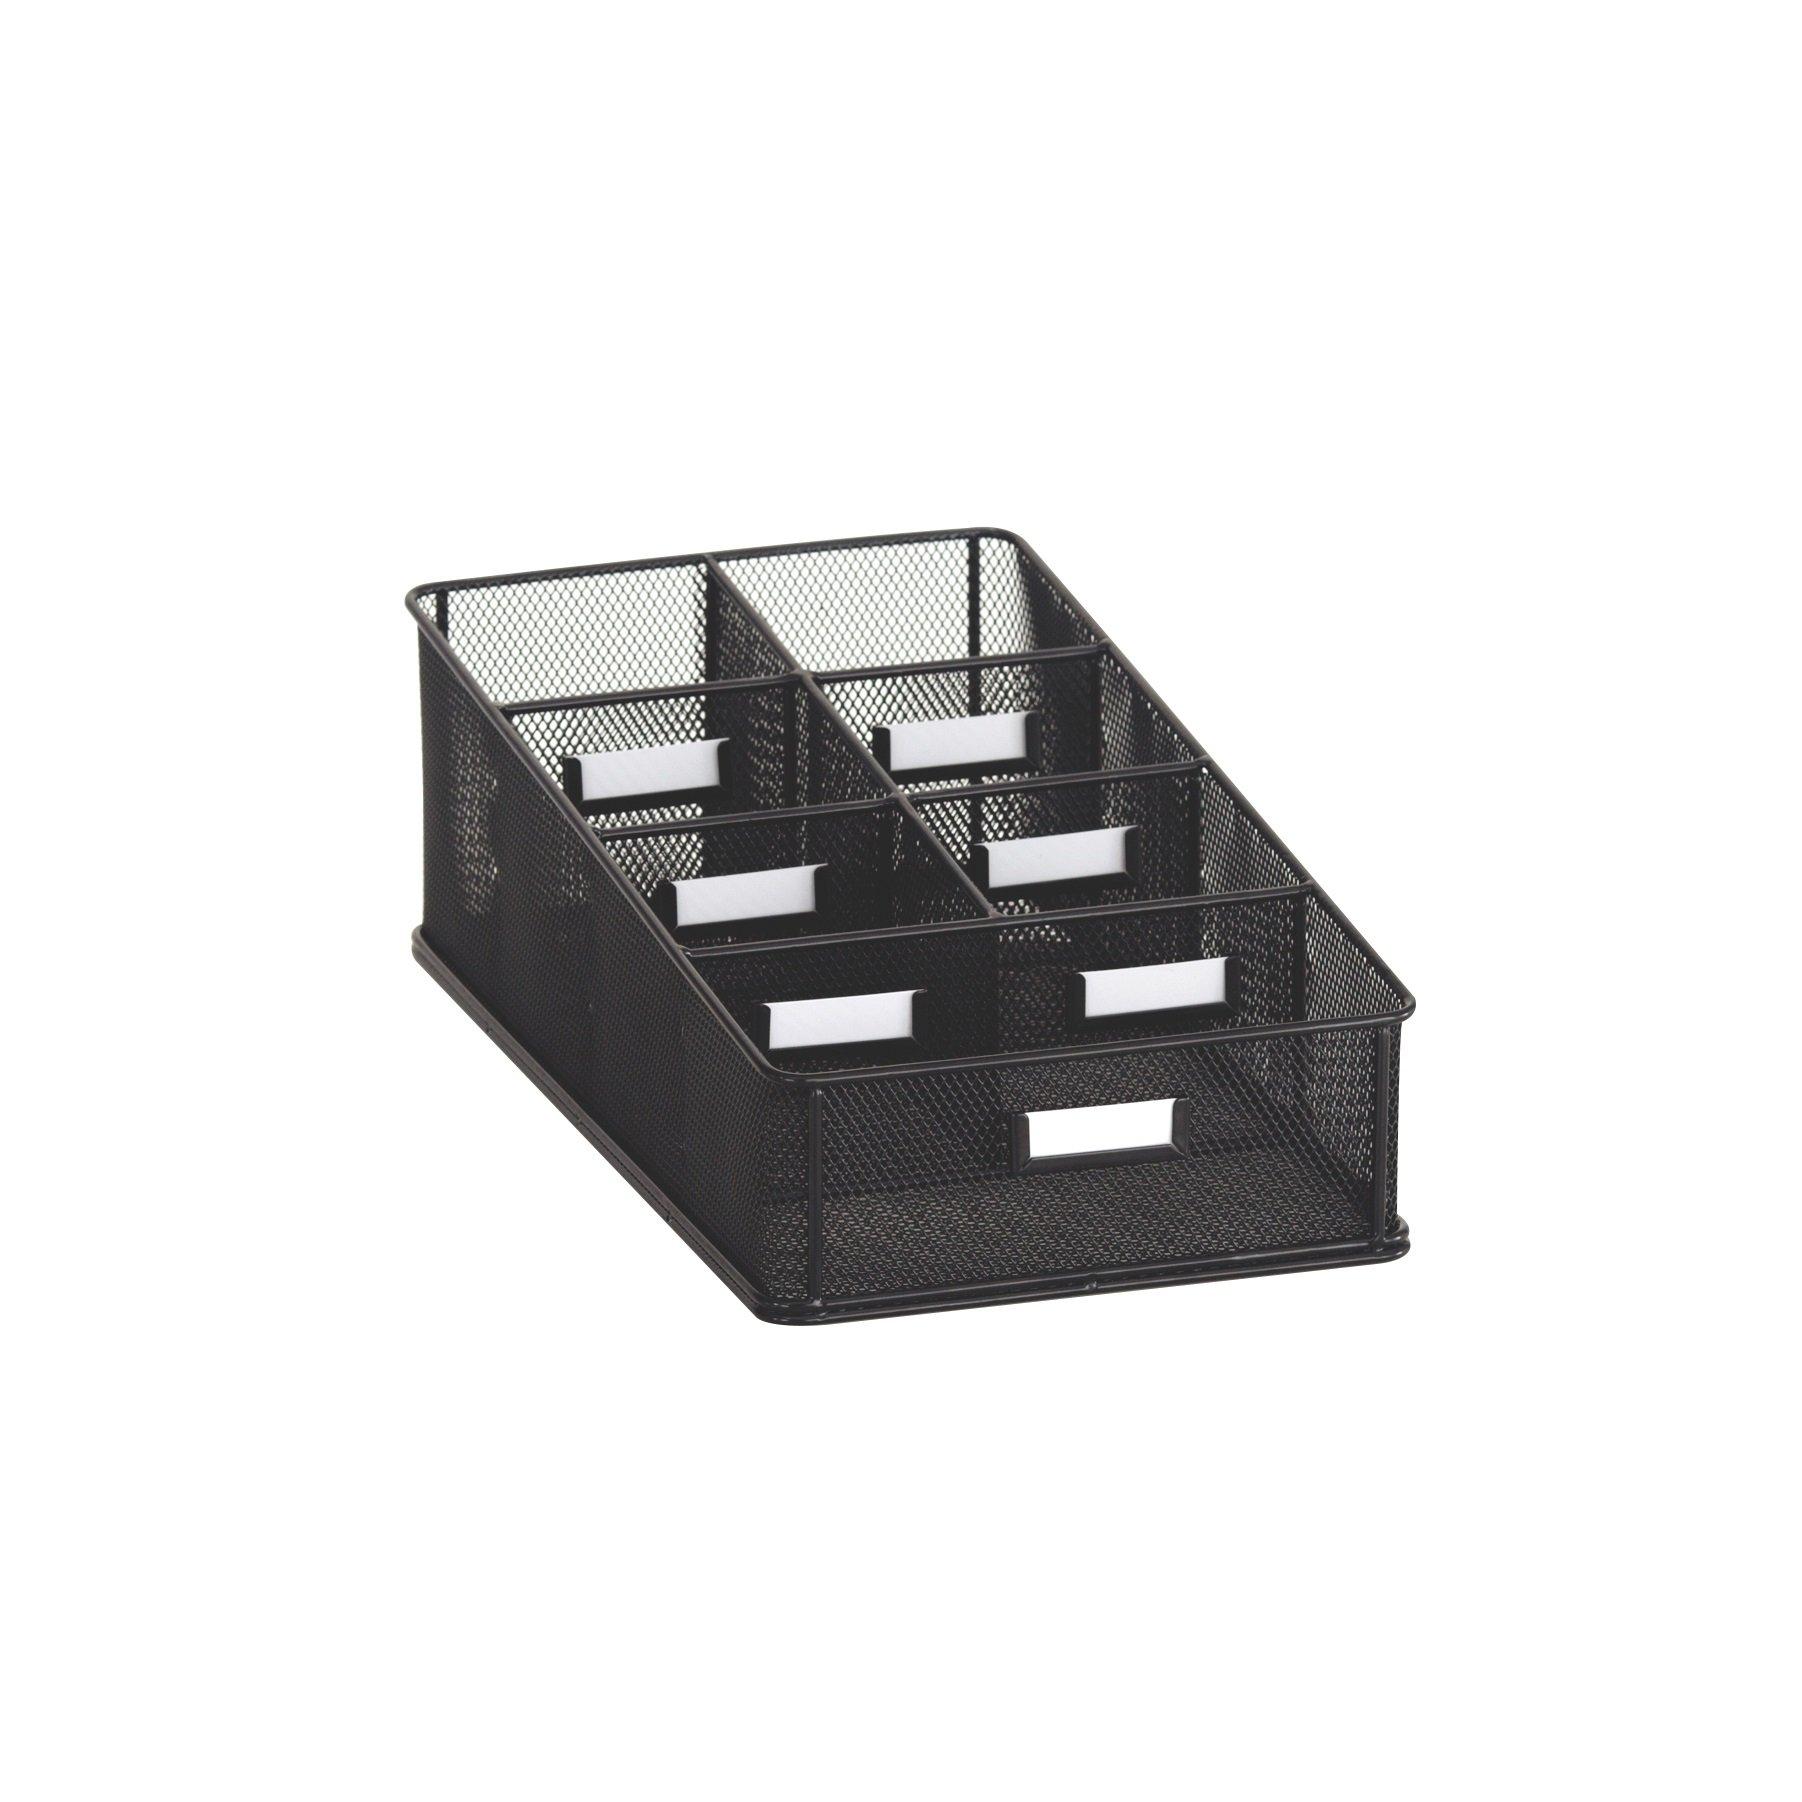 Safco Products 3291BL Onyx Mesh Condiment Carton Organizer, Black